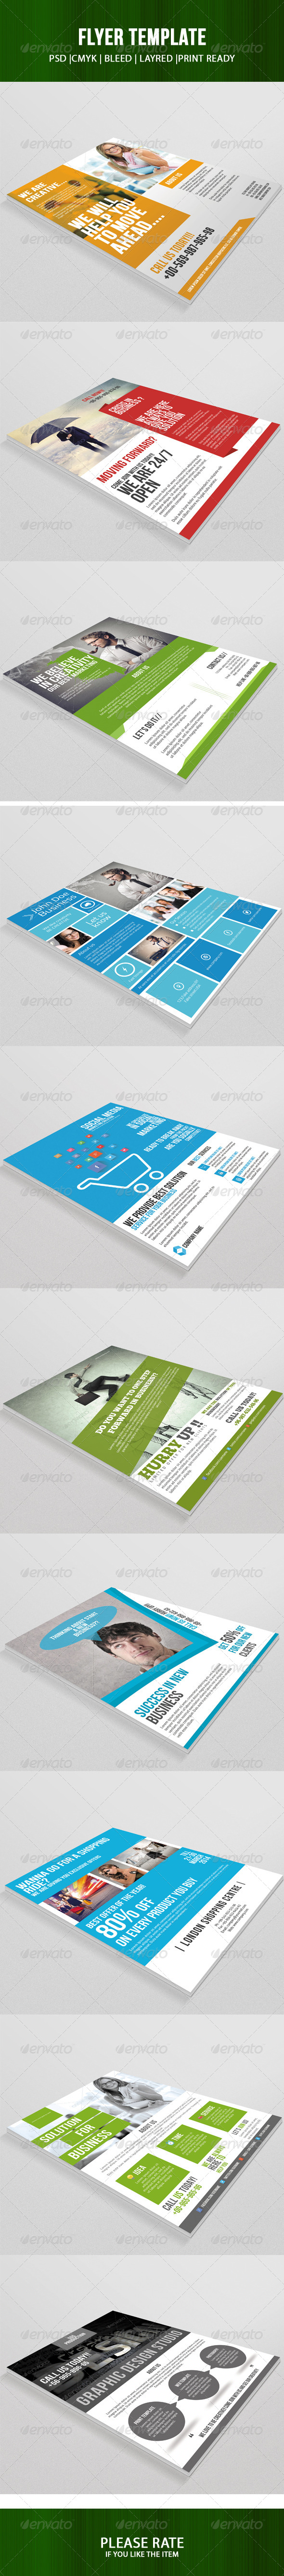 GraphicRiver 10 Flyer Template Bundle 7216168